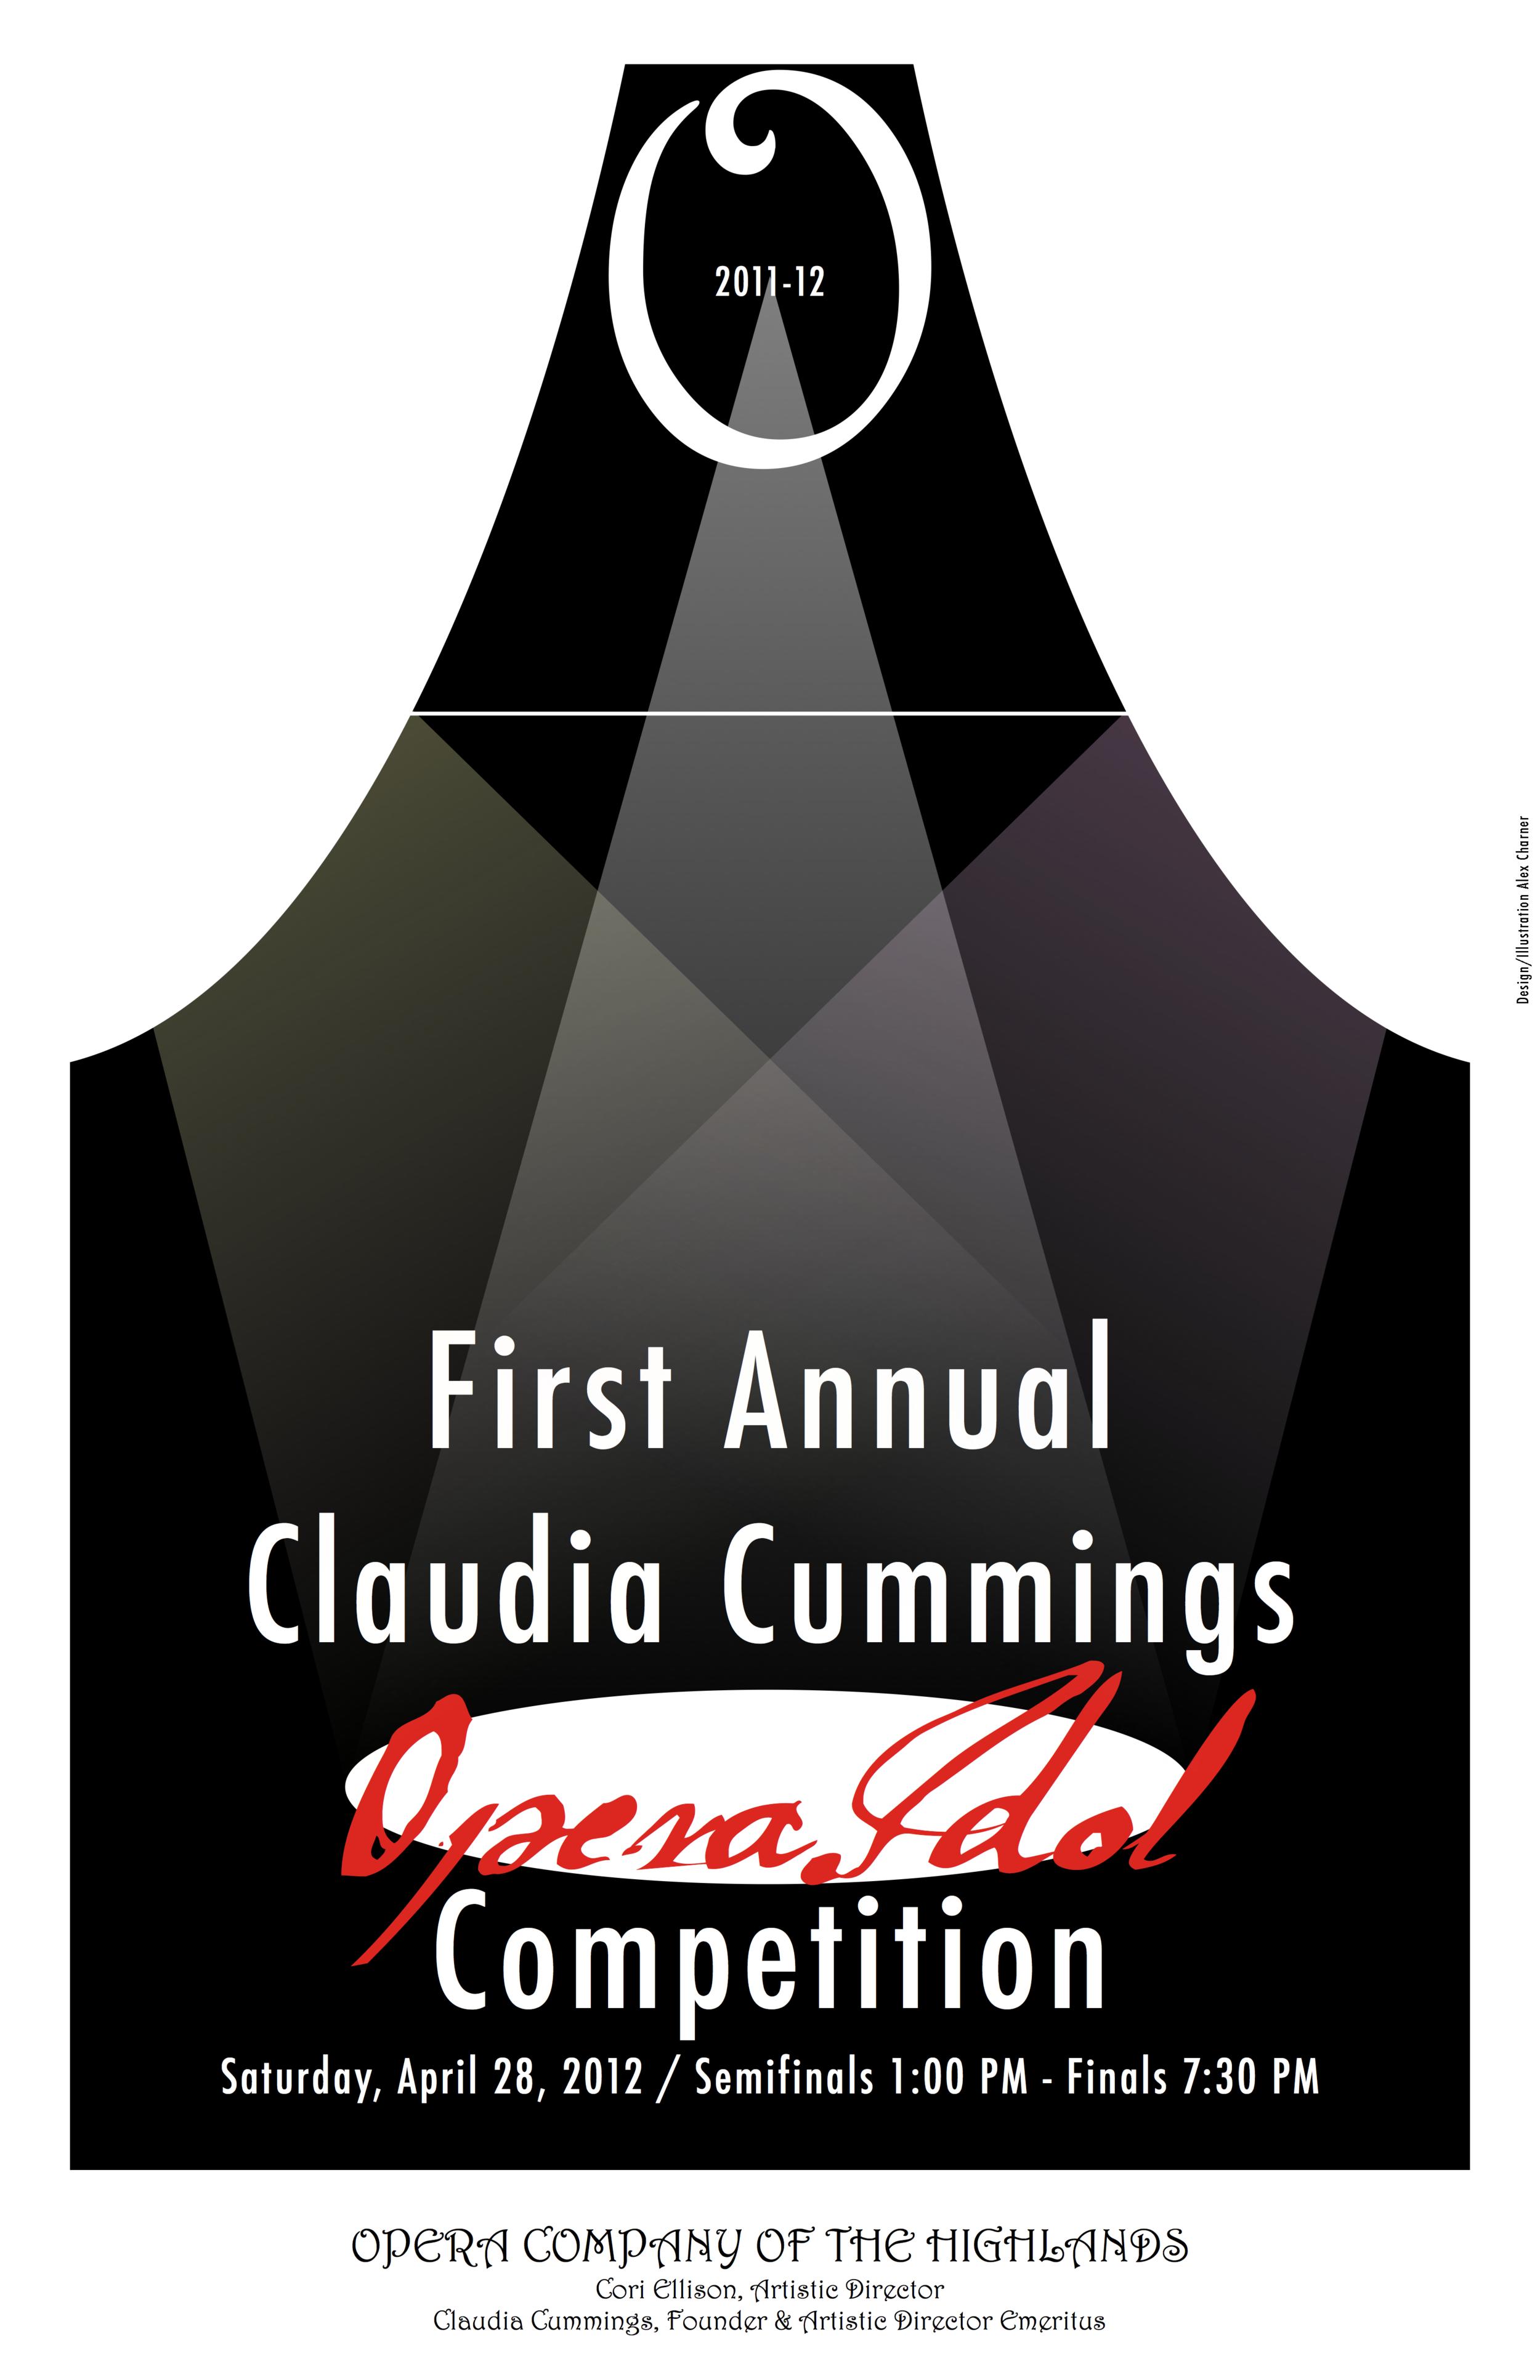 First Annual Claudia Cummings Opera Idol Competition